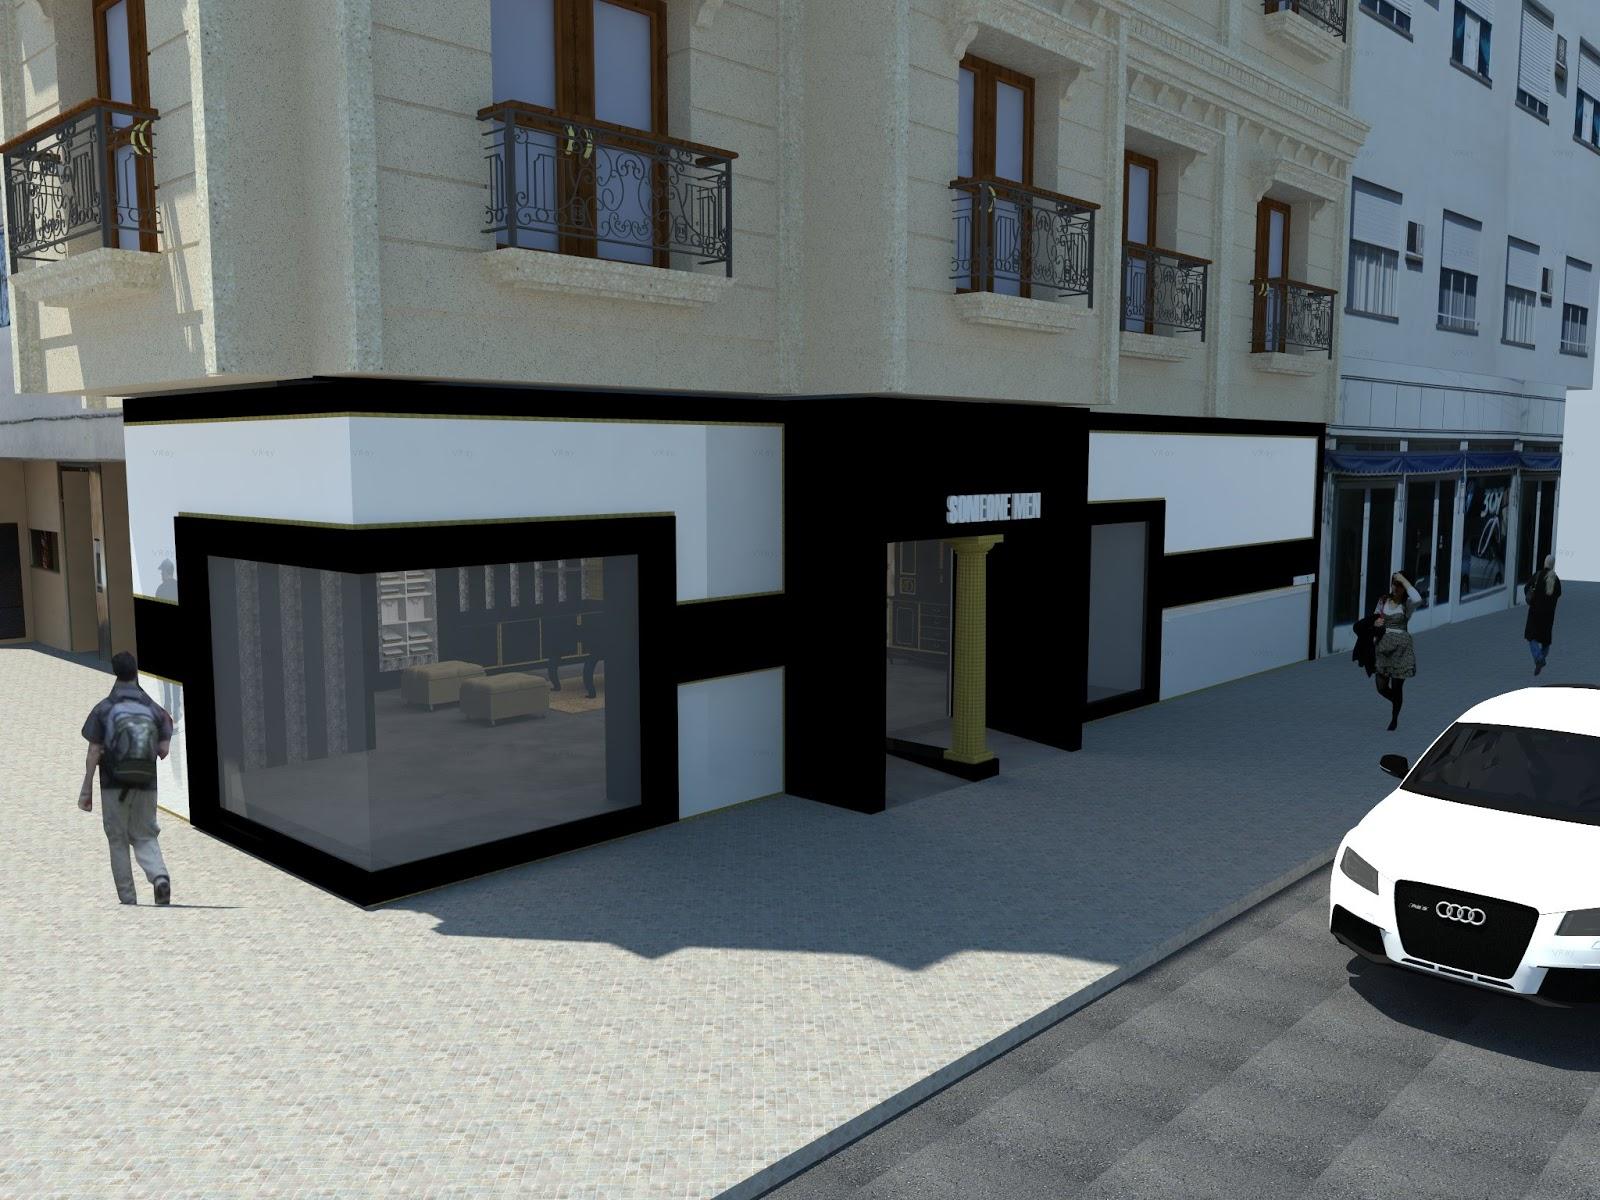 Dise o de interiores escuela de arte de motril tienda de for Fachadas de almacenes modernos